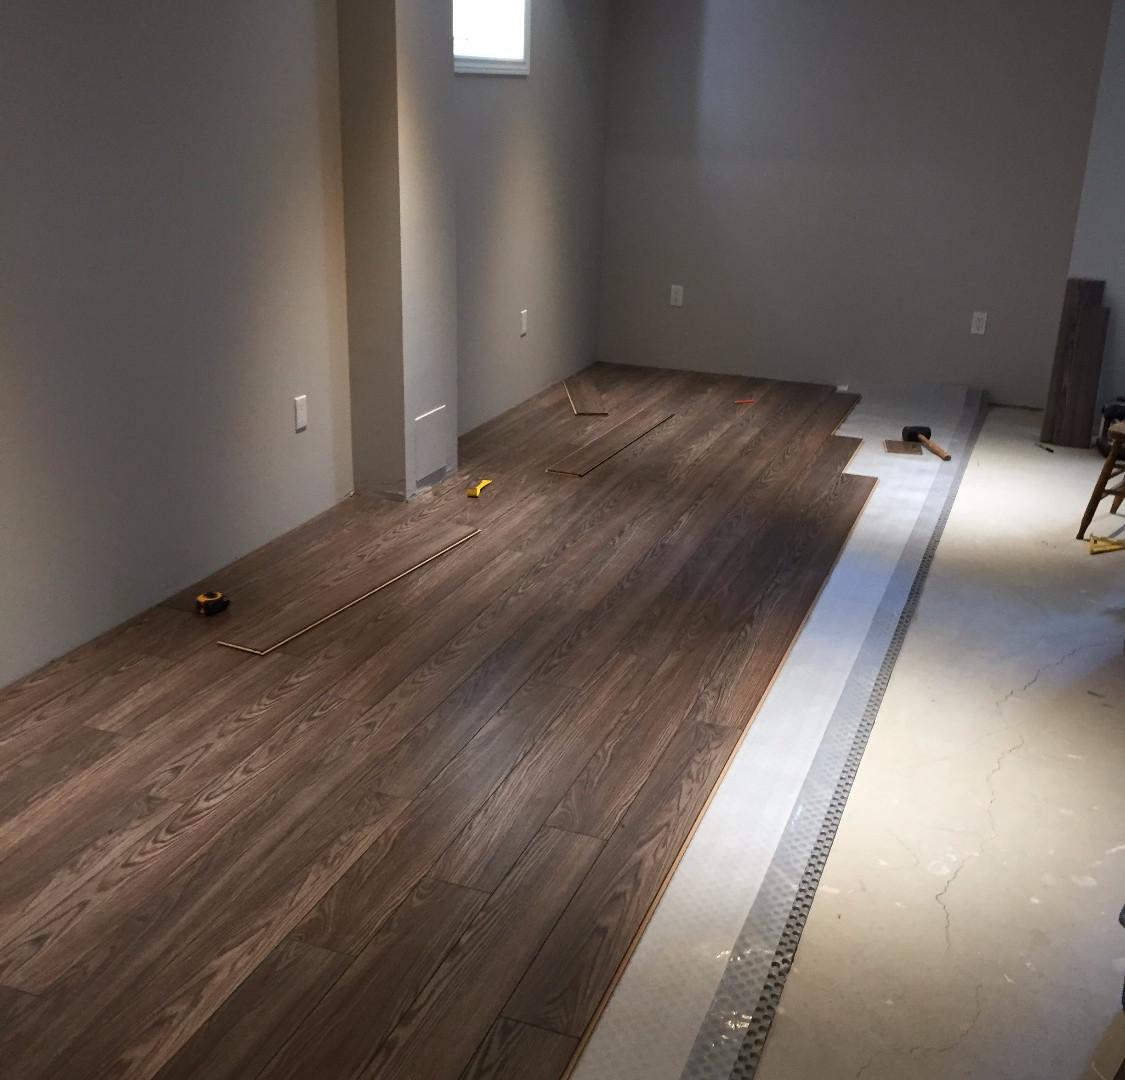 Jonesridge Basement Flooring (1/2)